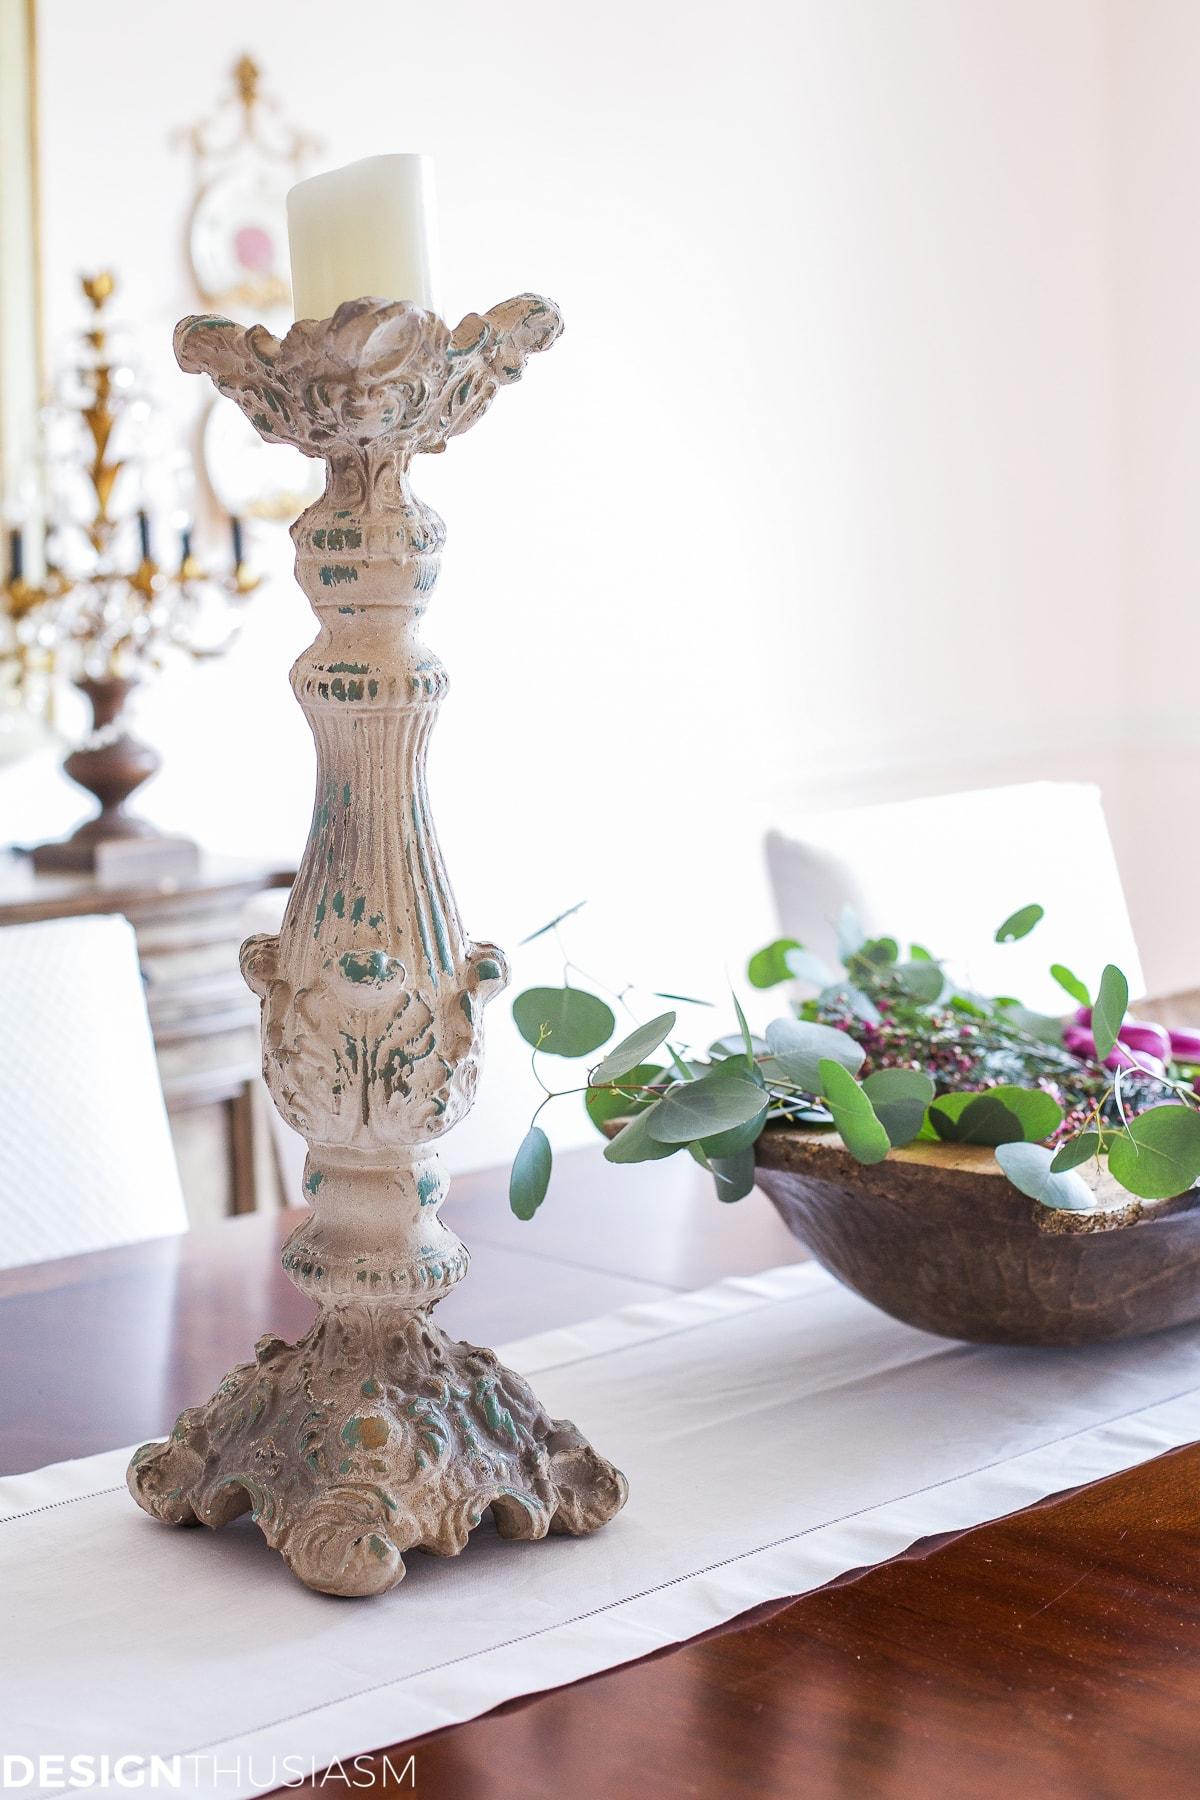 Elegant dining rooms | chippy candlesticks | Designthusiasm.com